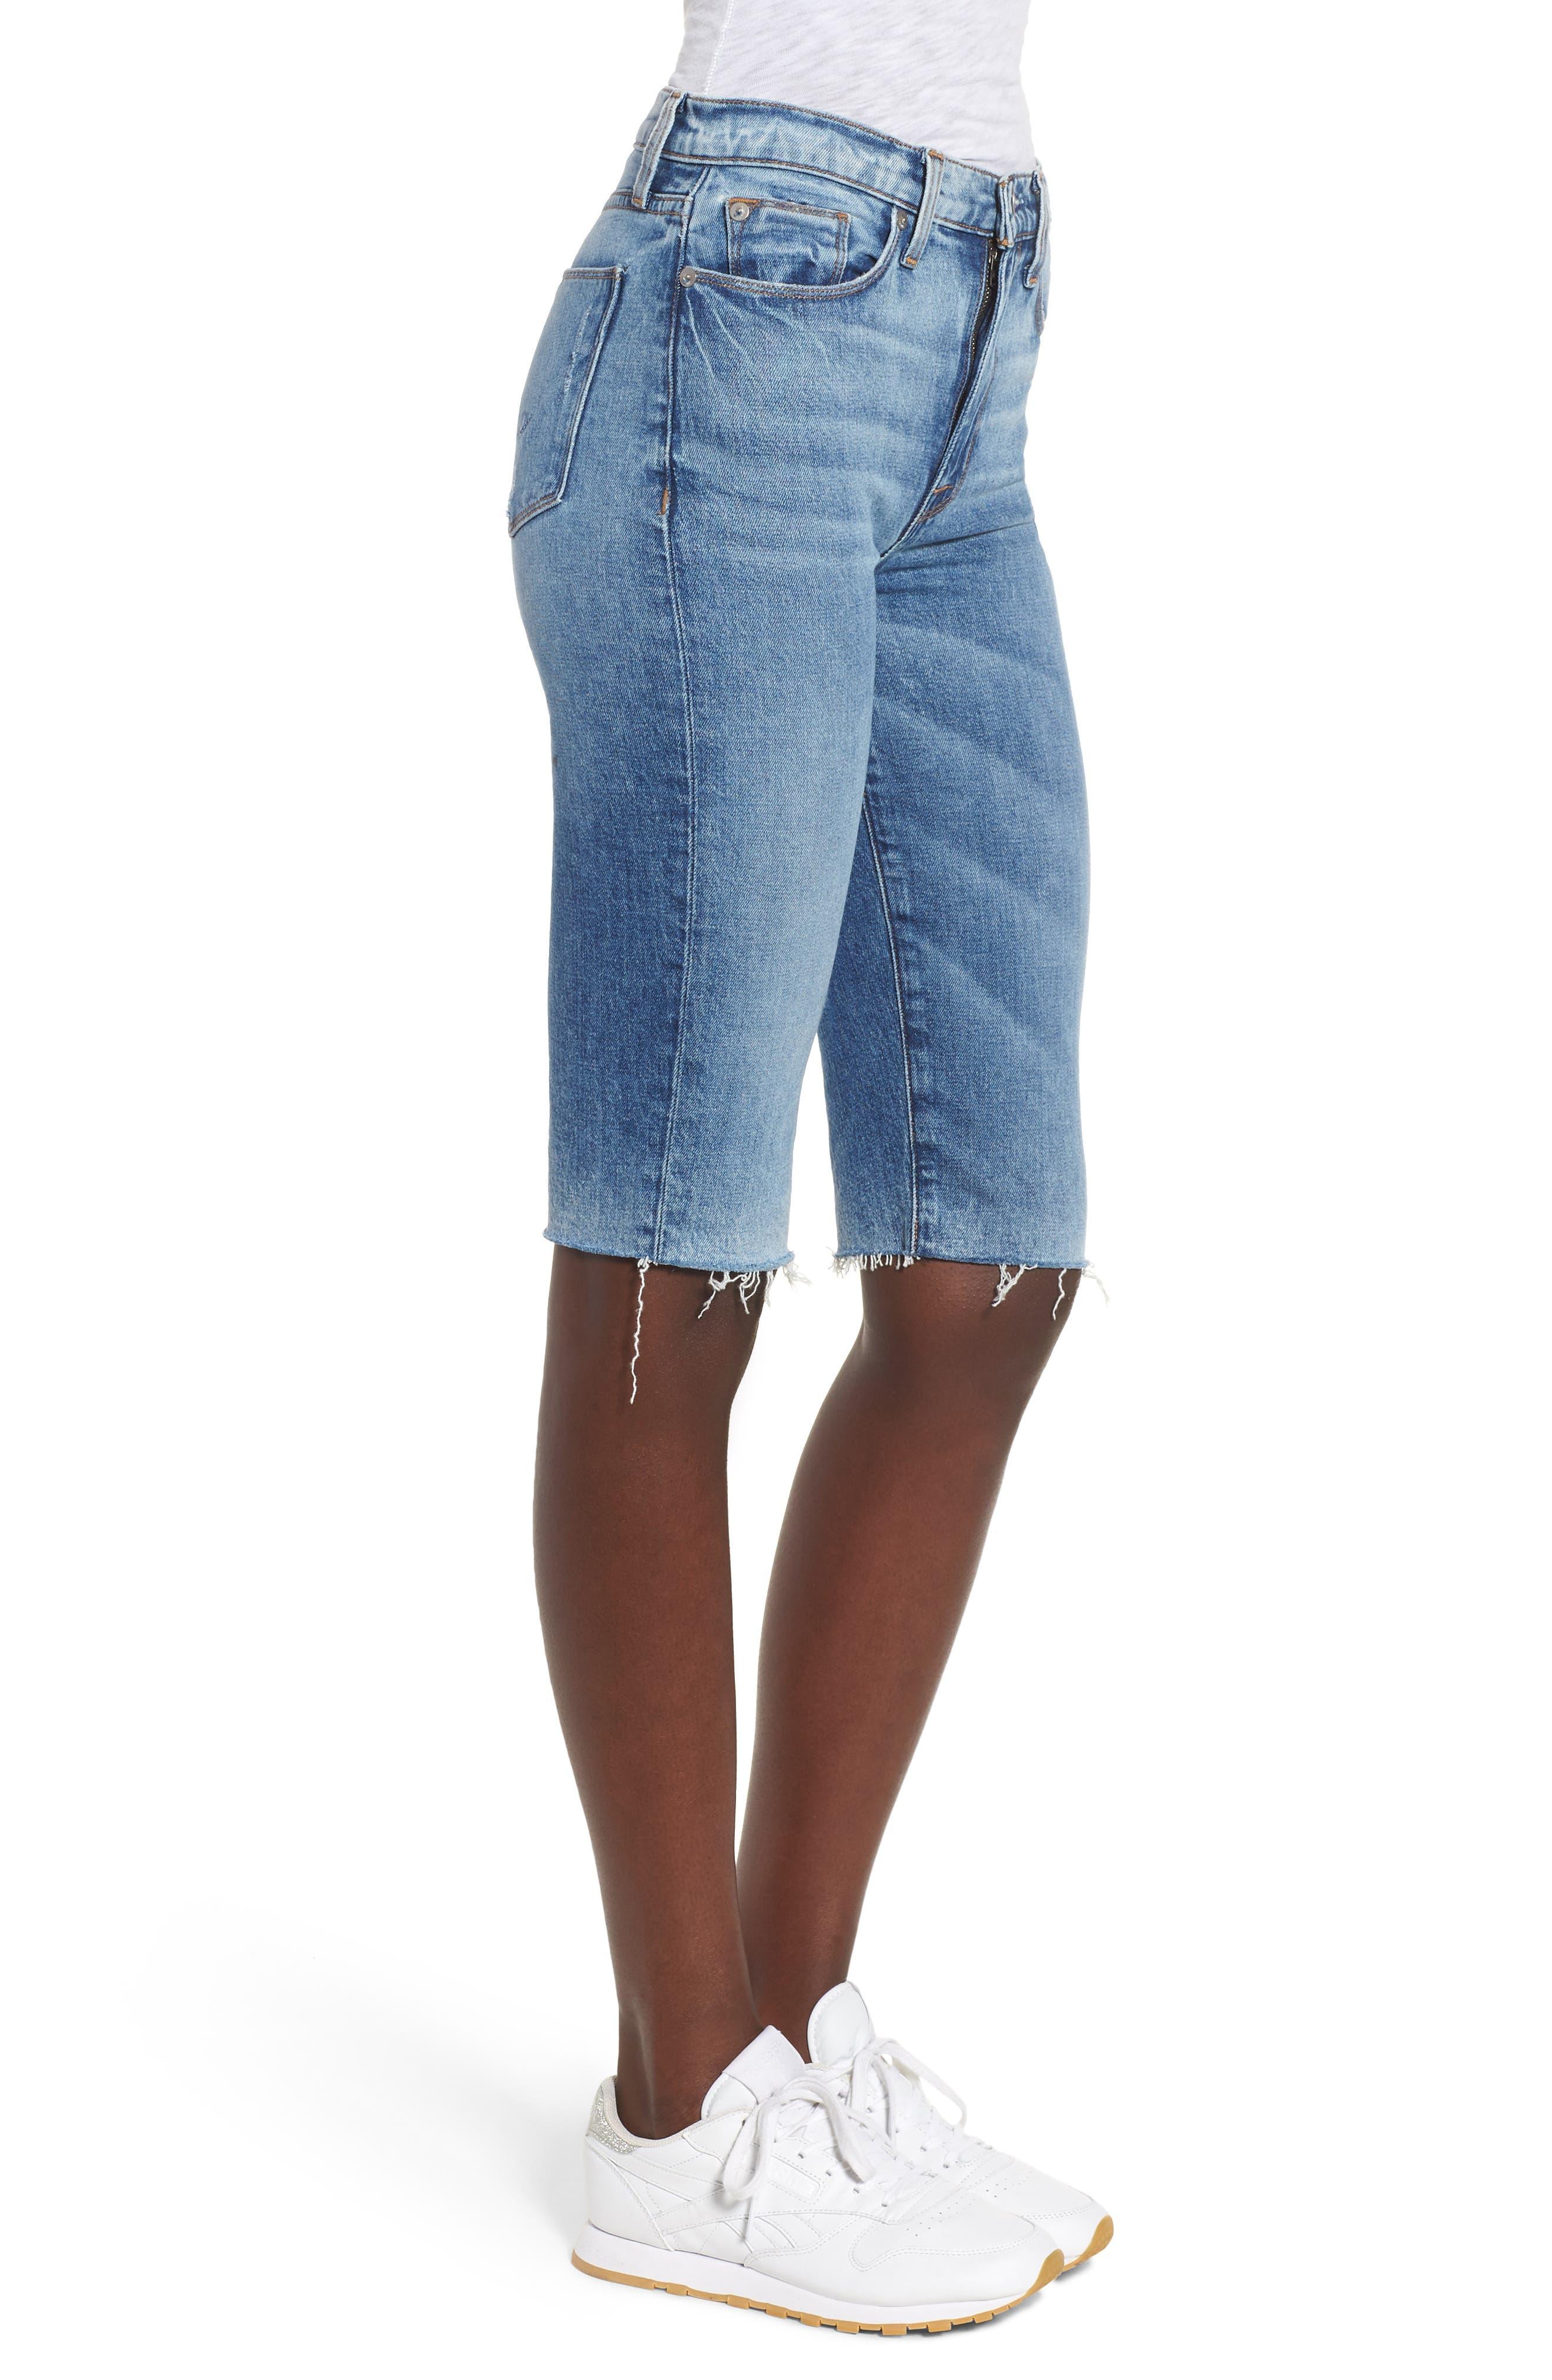 Zoeey High Waist Cutoff Boyfriend Shorts,                             Alternate thumbnail 3, color,                             JUST FOR KICKS